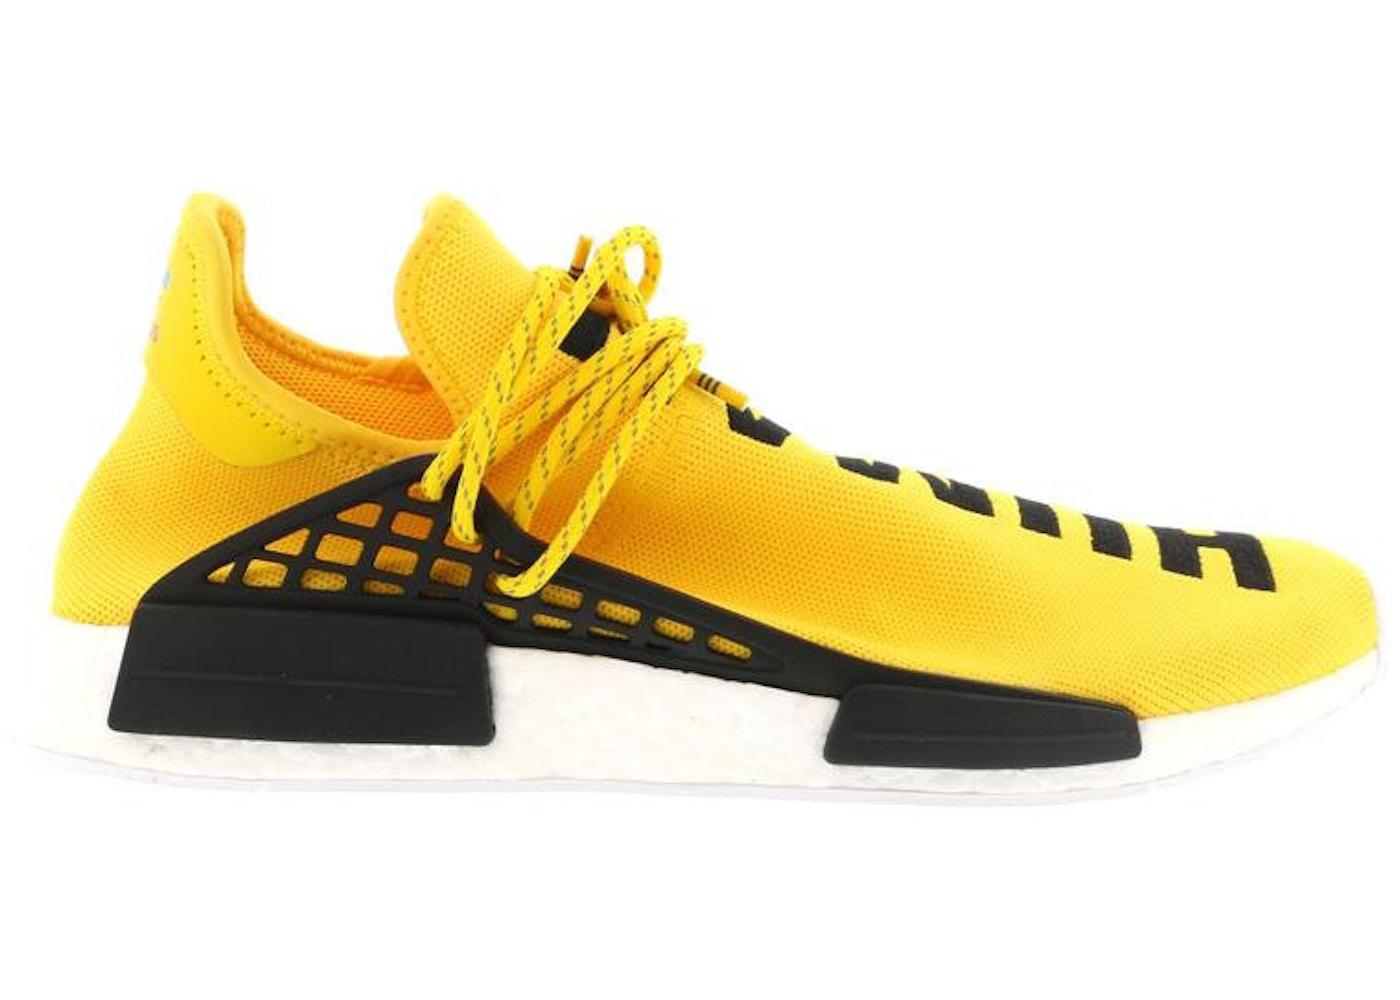 Página web oficial realmente cómodo San Francisco adidas NMD HU Pharrell Human Race Yellow - BB0619